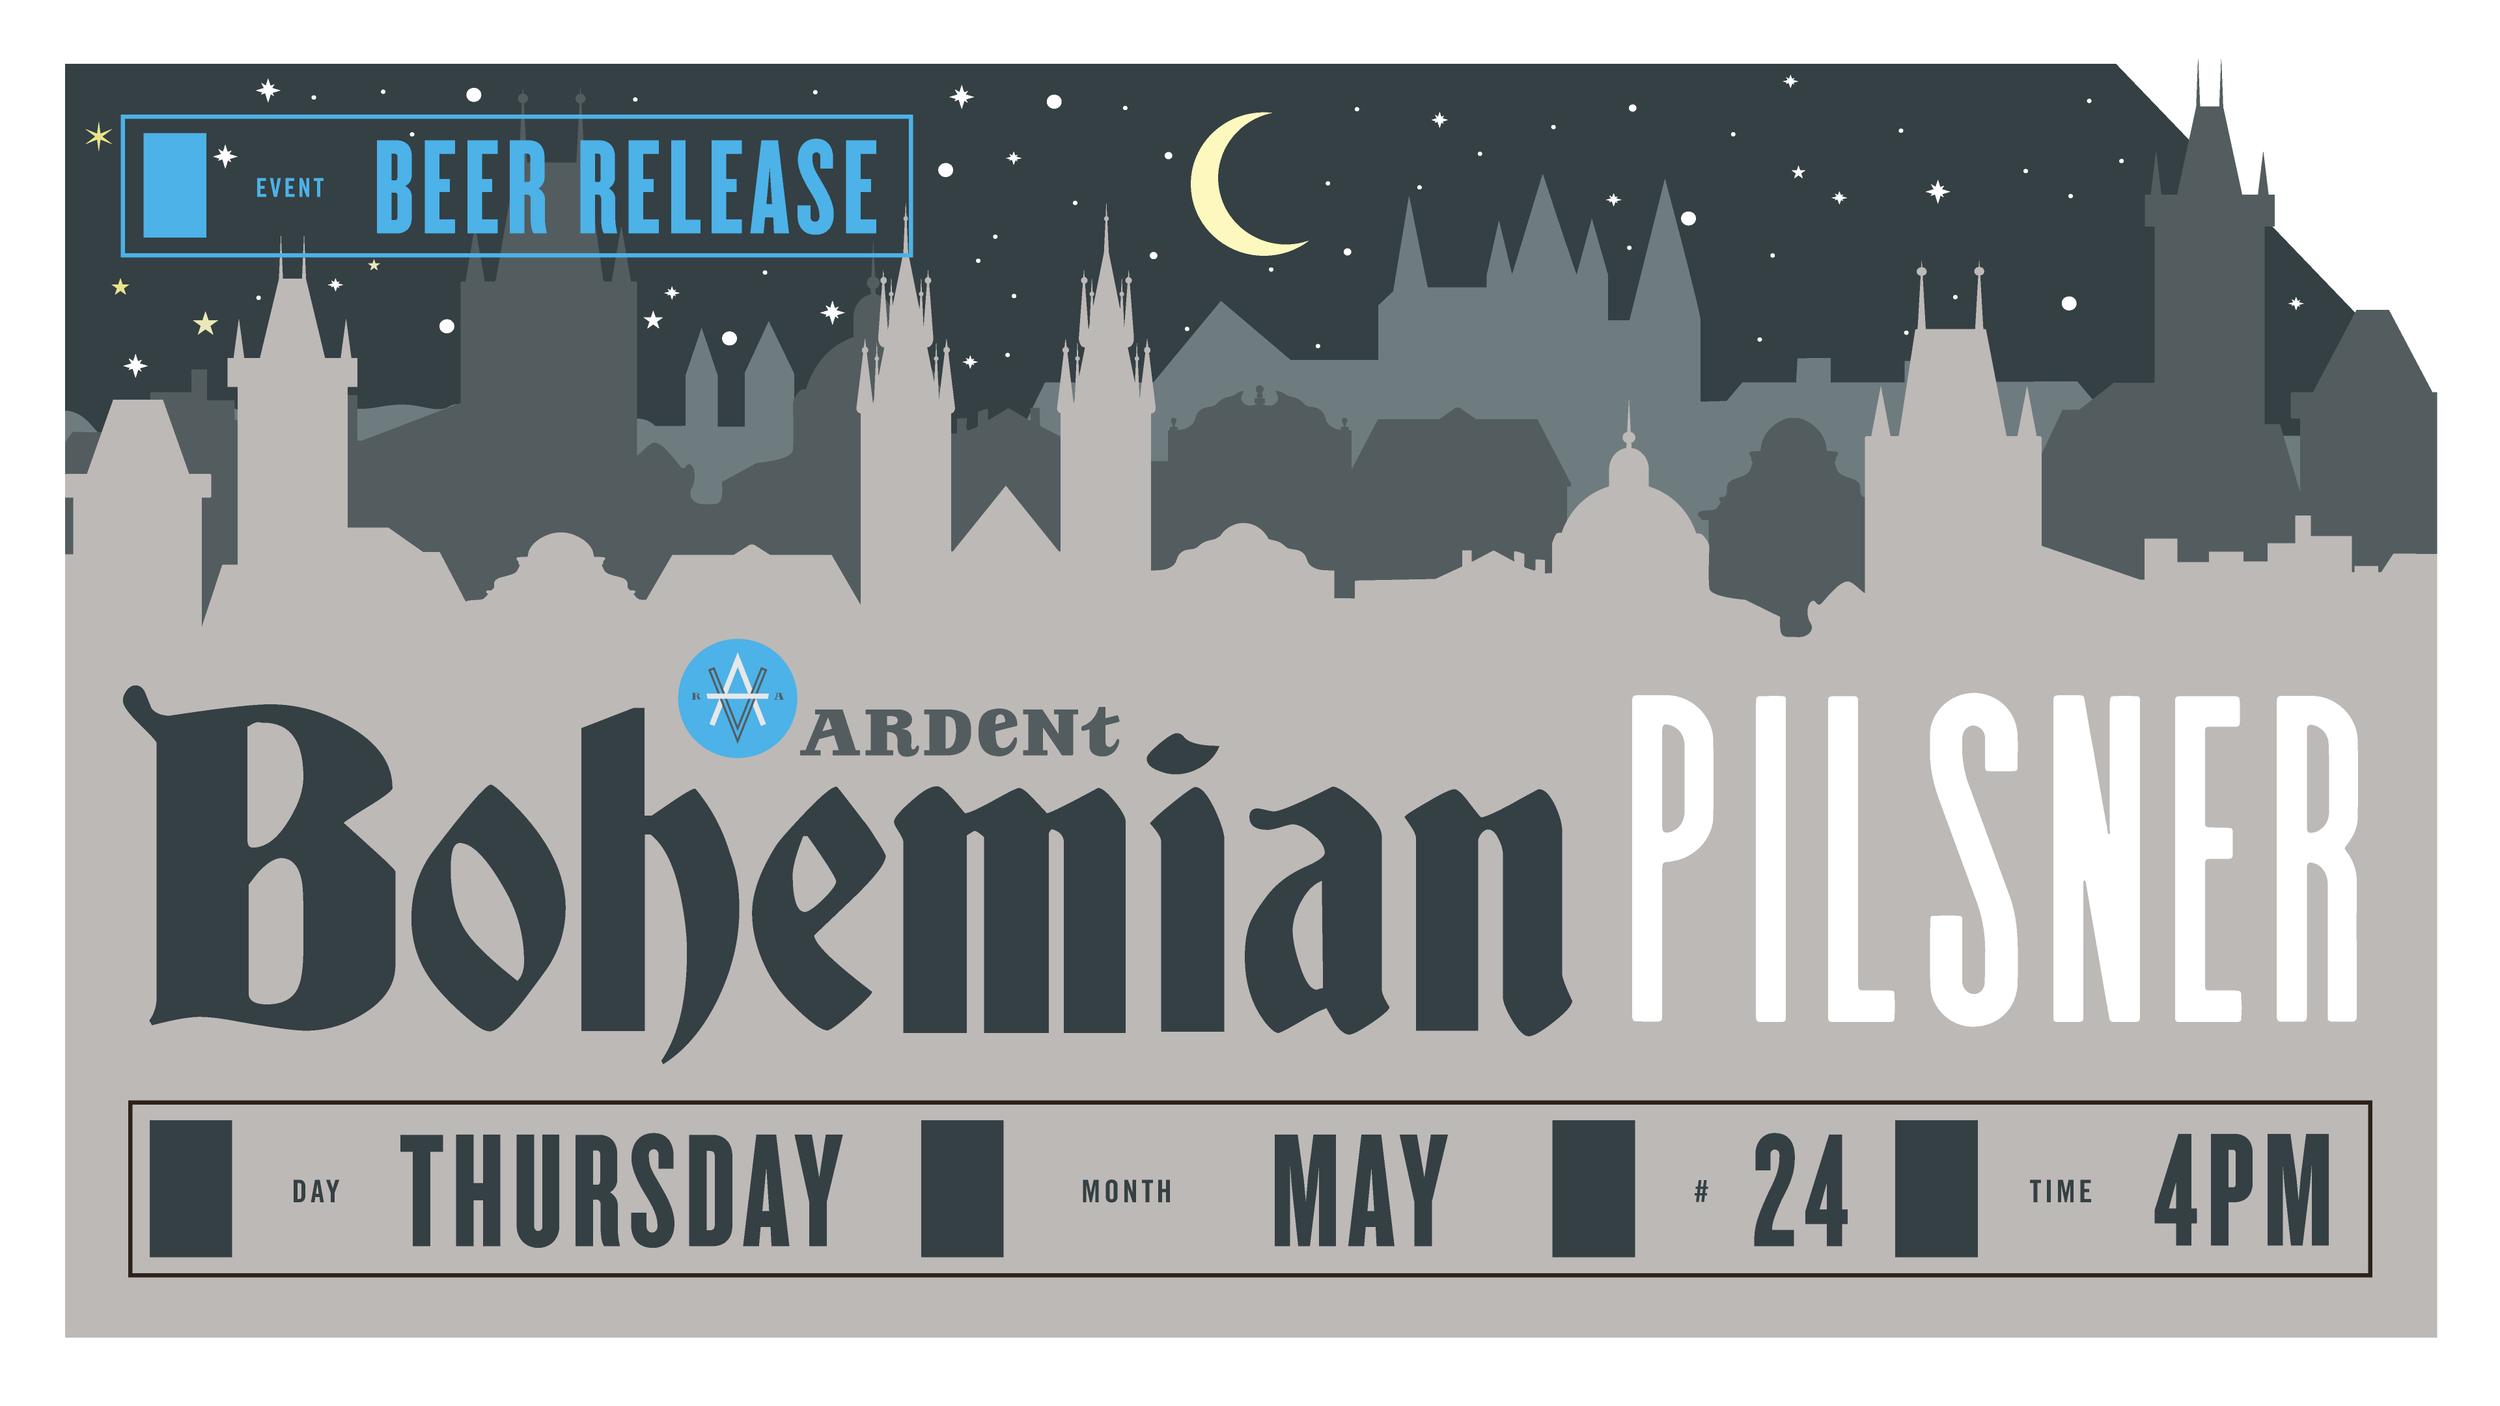 bohemian-fb-event.png